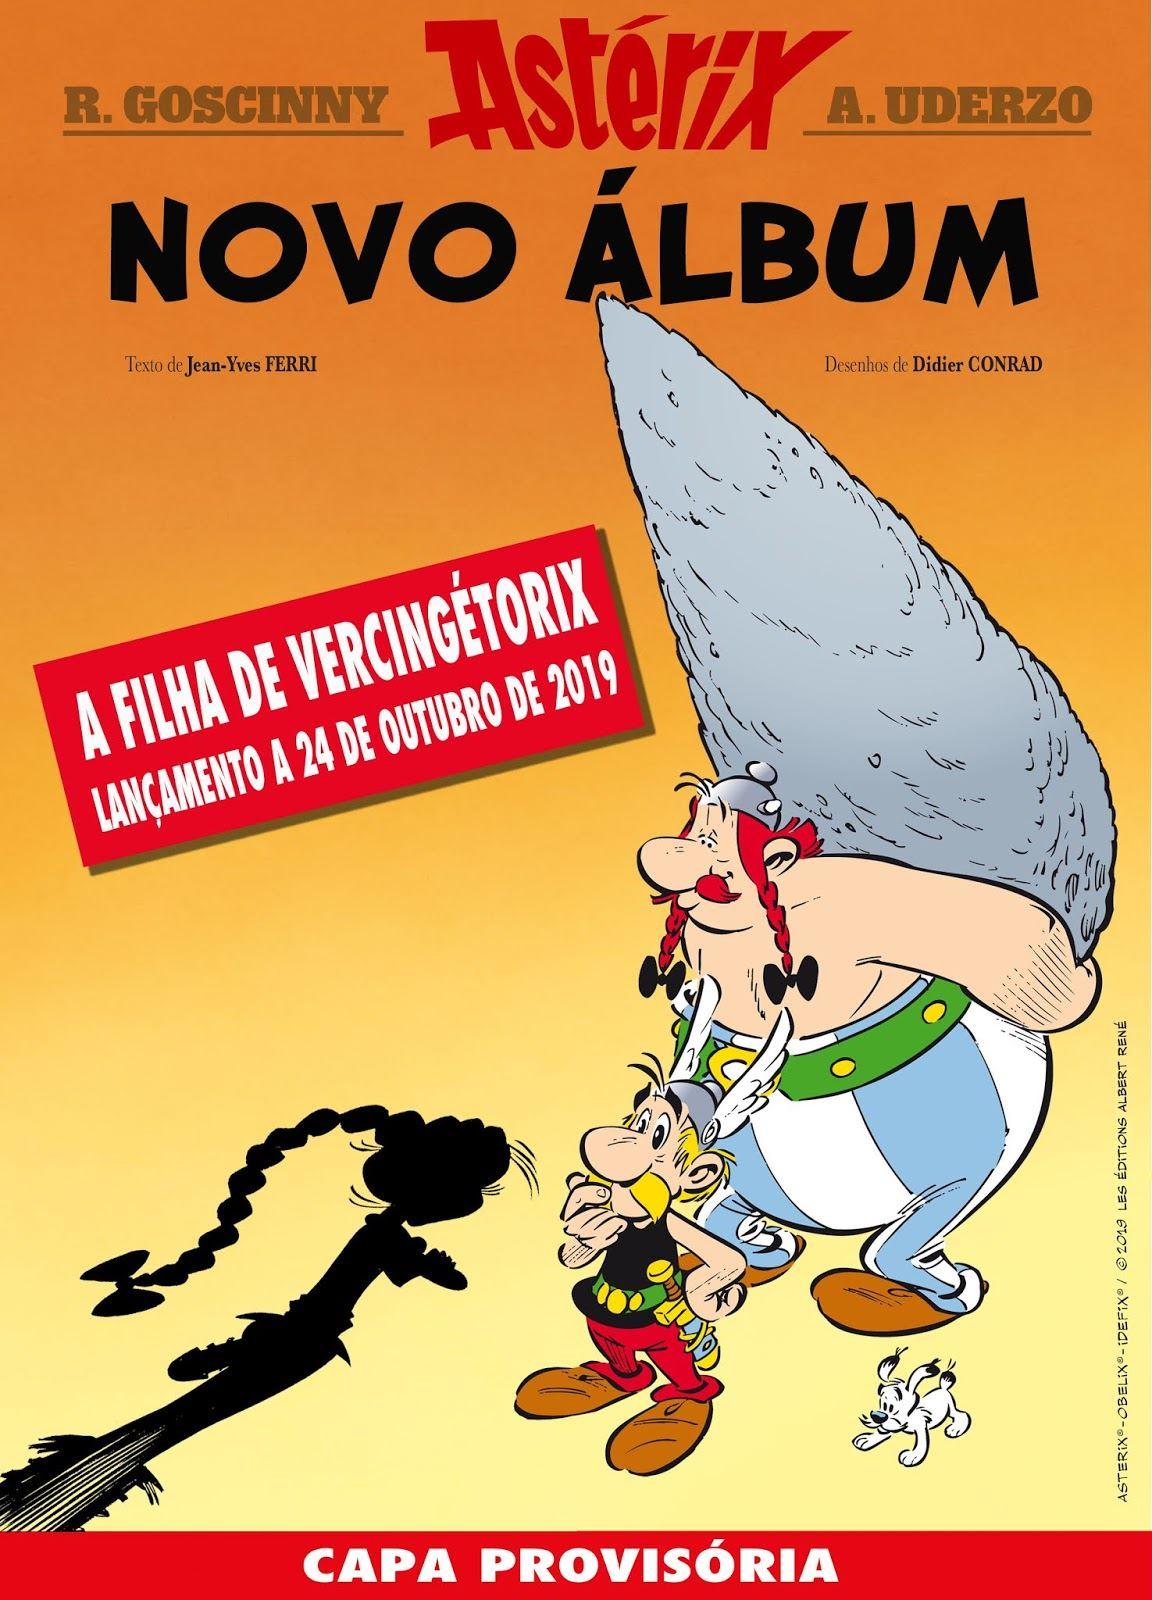 Asterix 38-capa provisoria_PORT